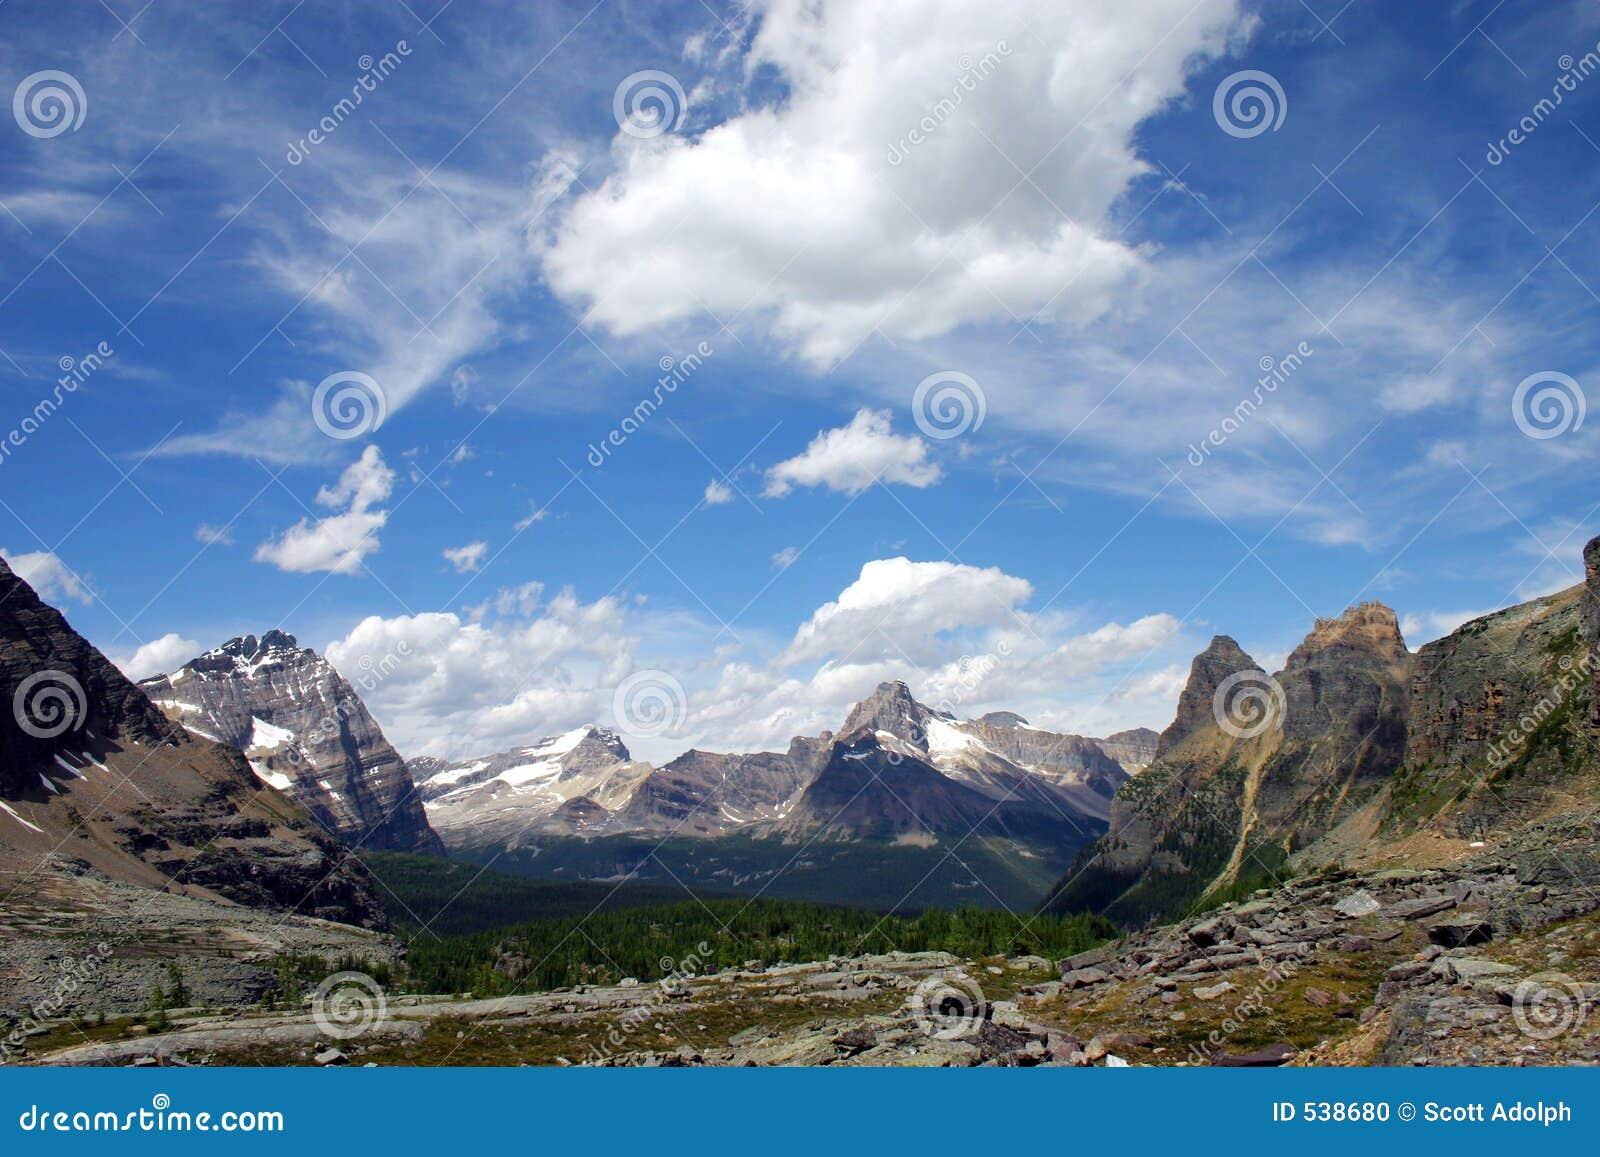 Download 天堂 库存照片. 图片 包括有 的treadled, 范围, 本质, 加盖, 野营, 罗基斯, 被砍的, 加拿大 - 538680